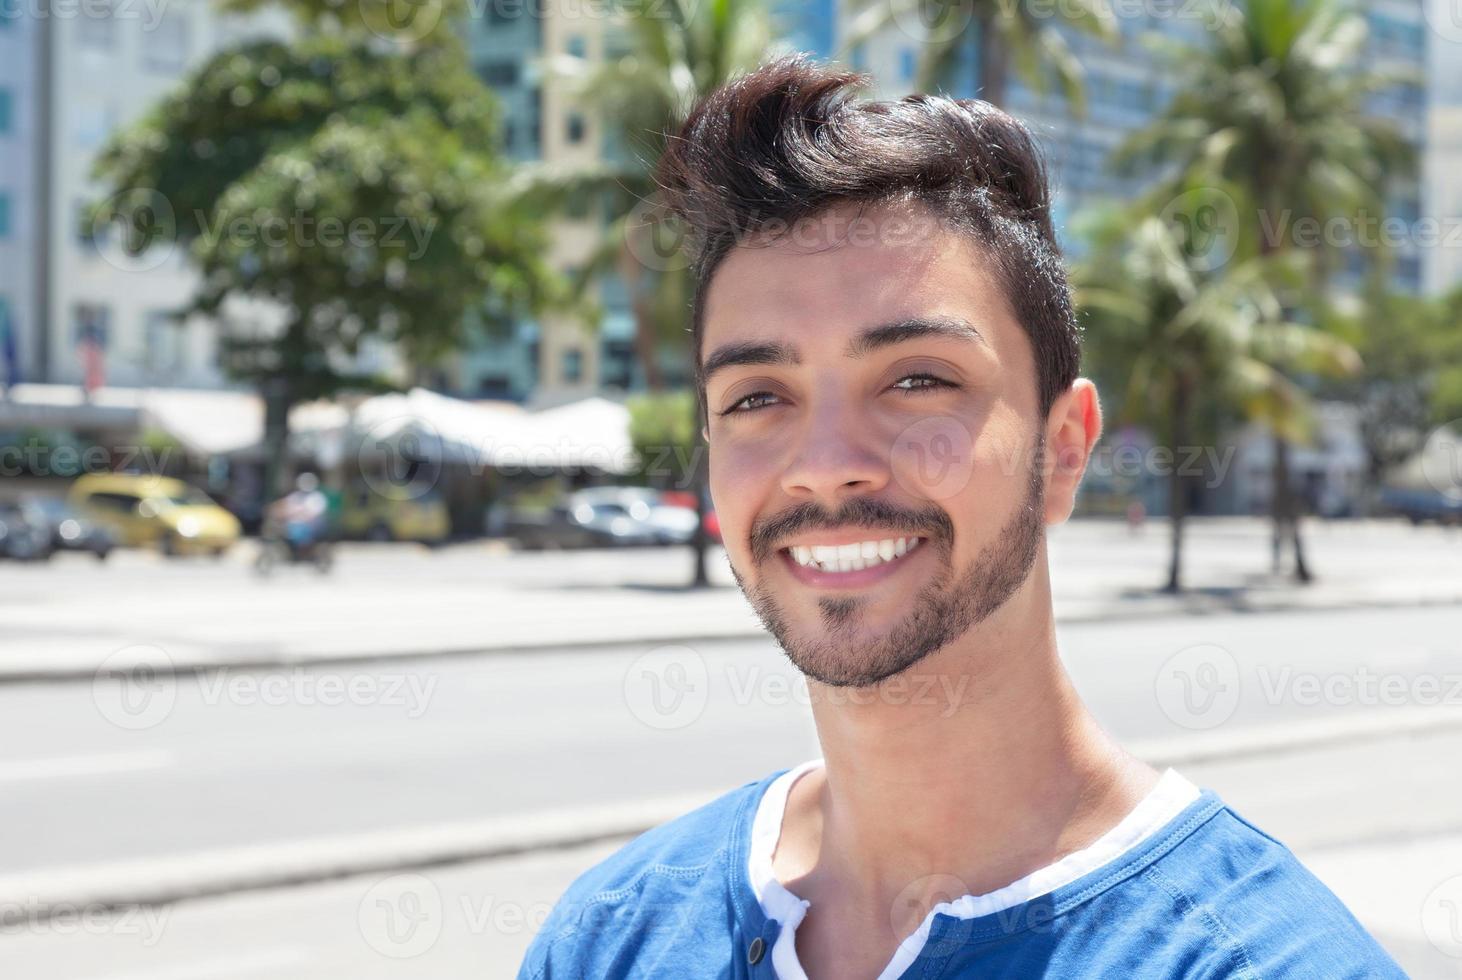 Dreaming brazilian guy in a modern city photo